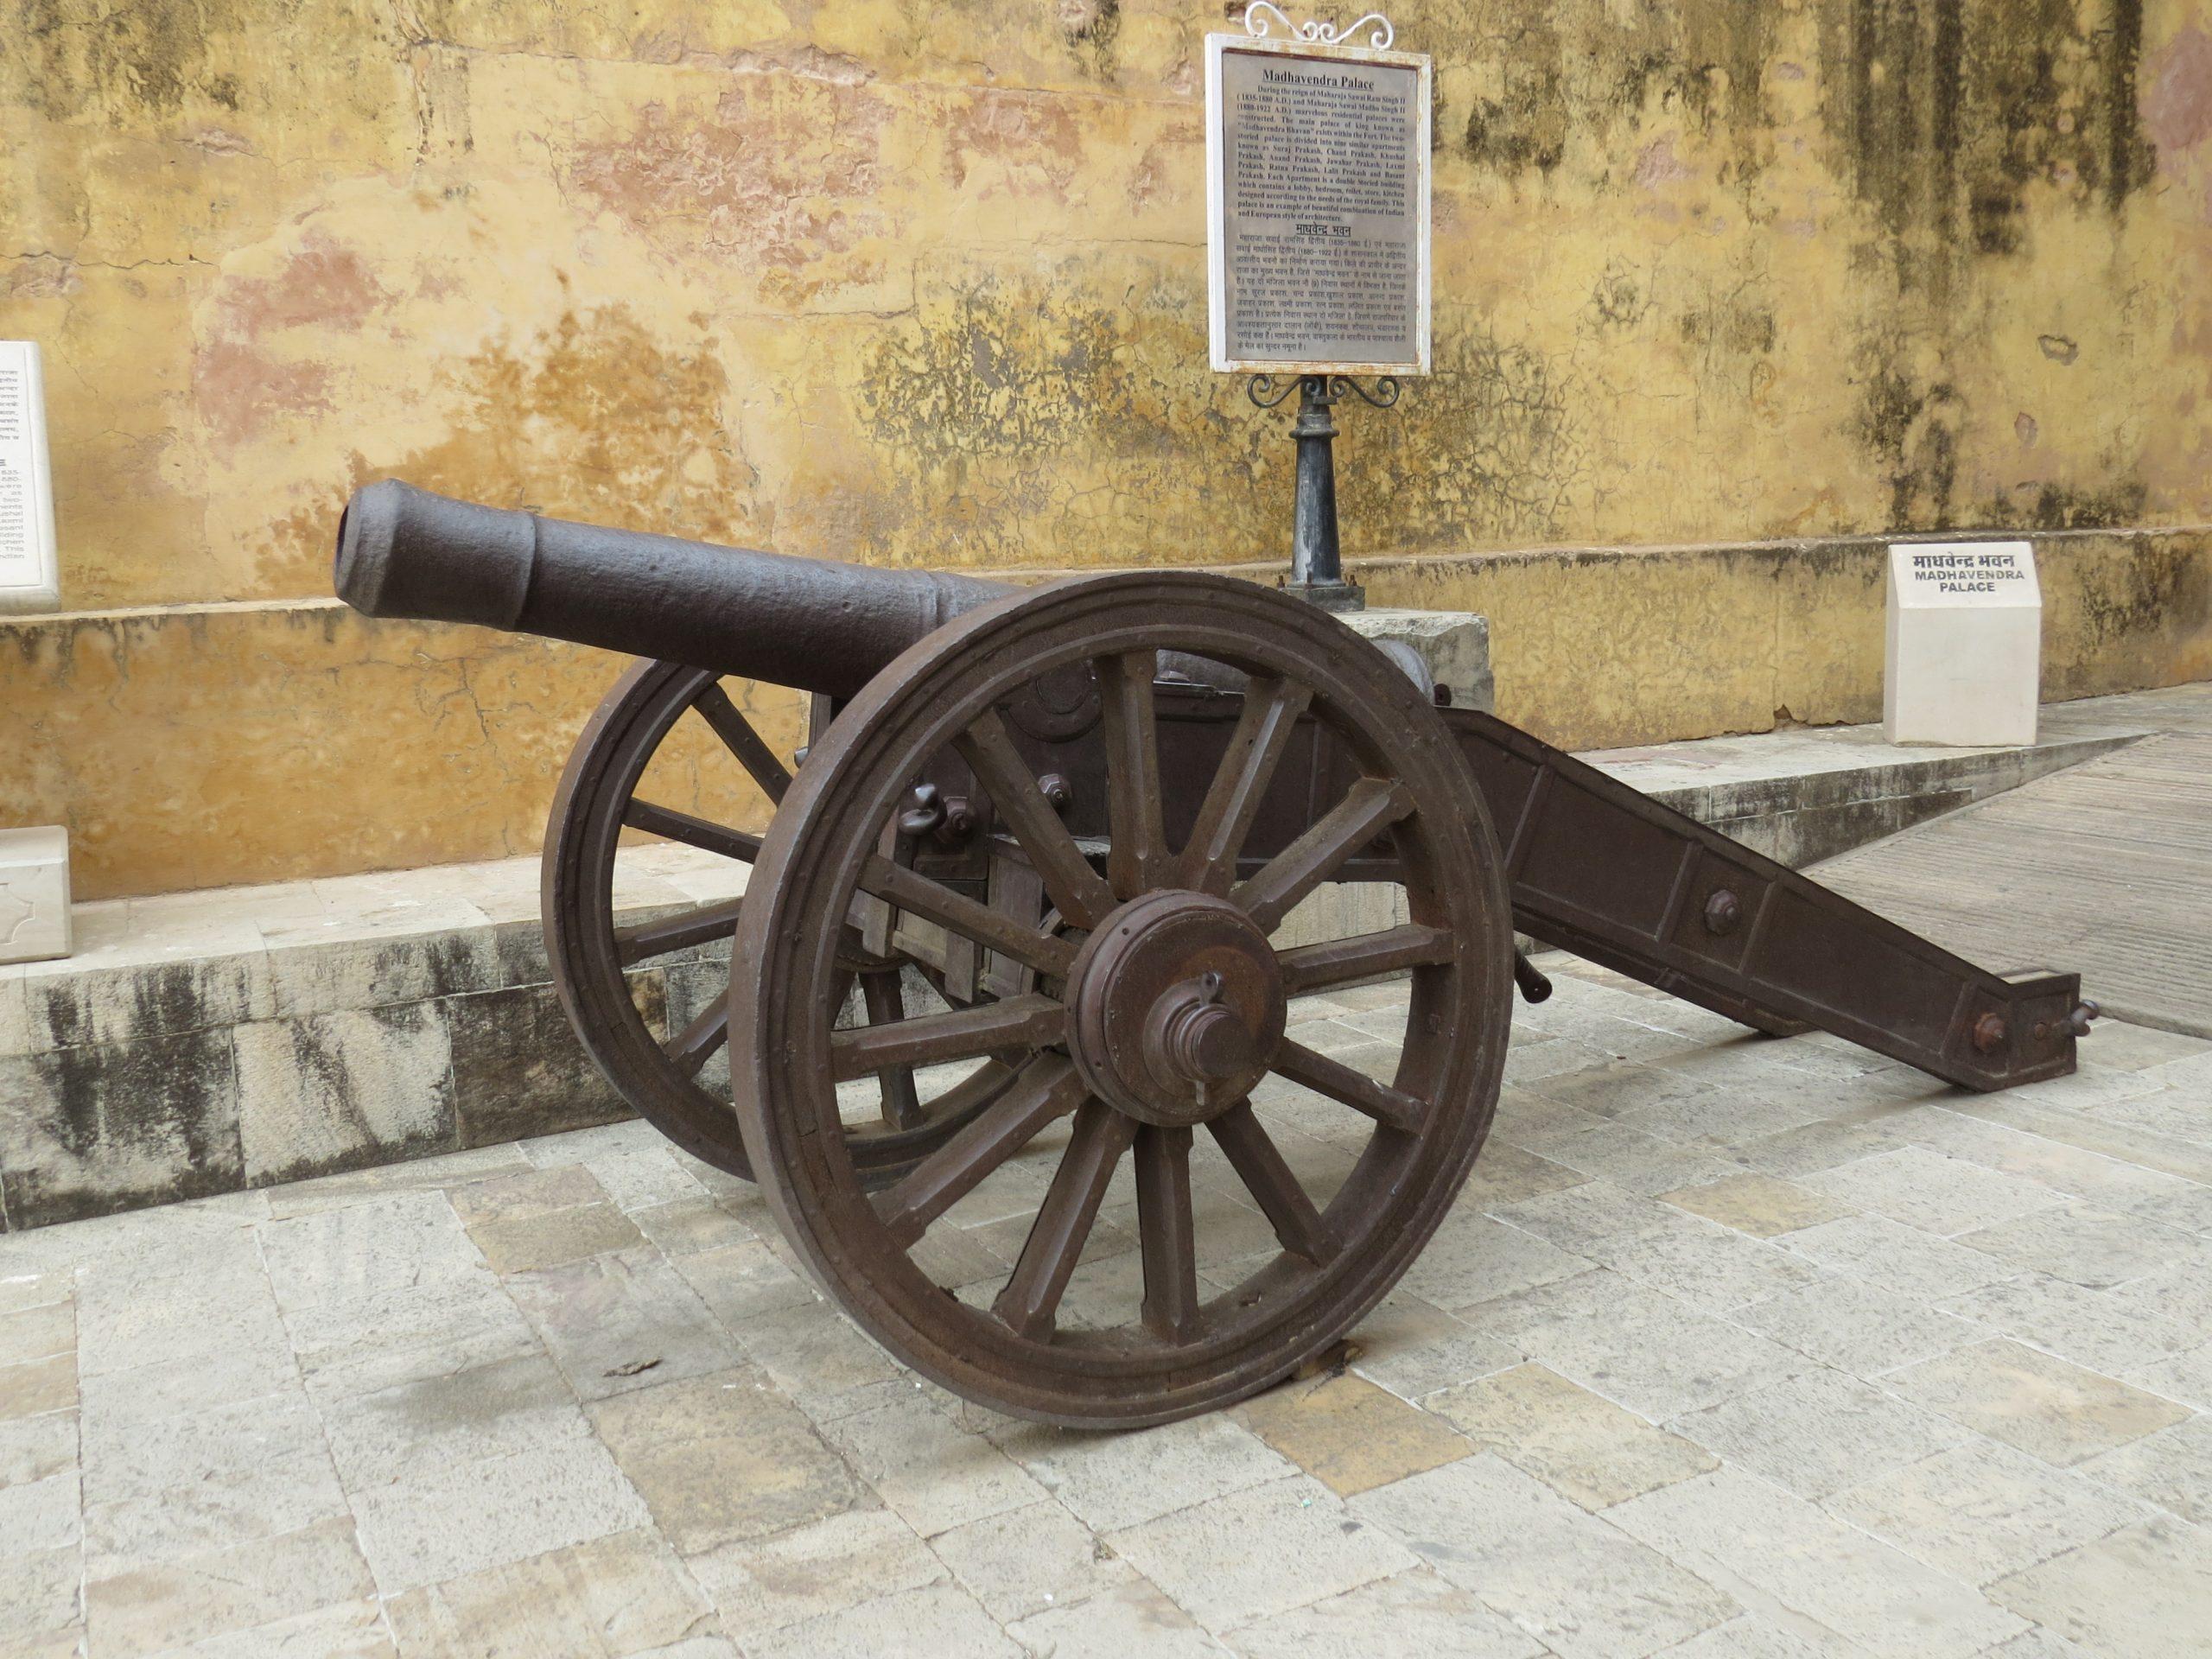 An old canon